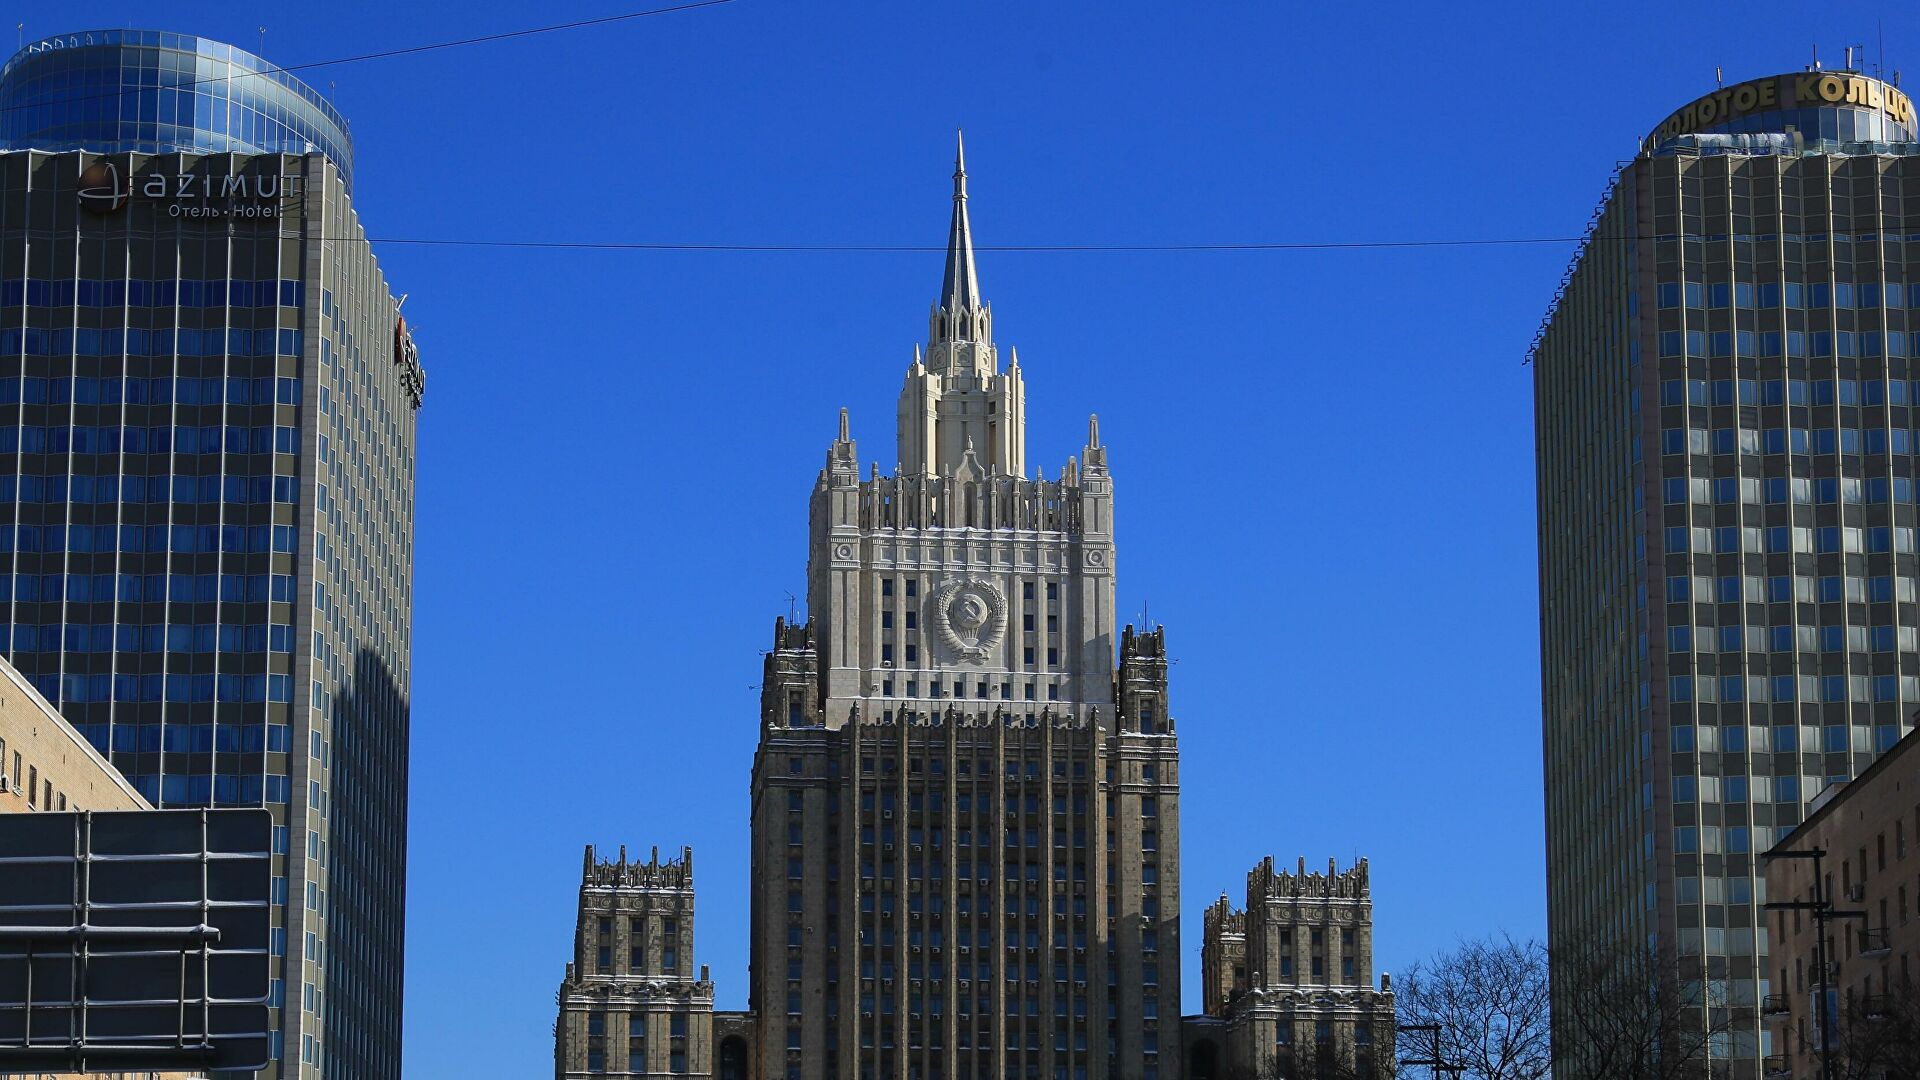 Москва: Аргументи Лондона да изгради свој нуклеарни потенцијал лажни